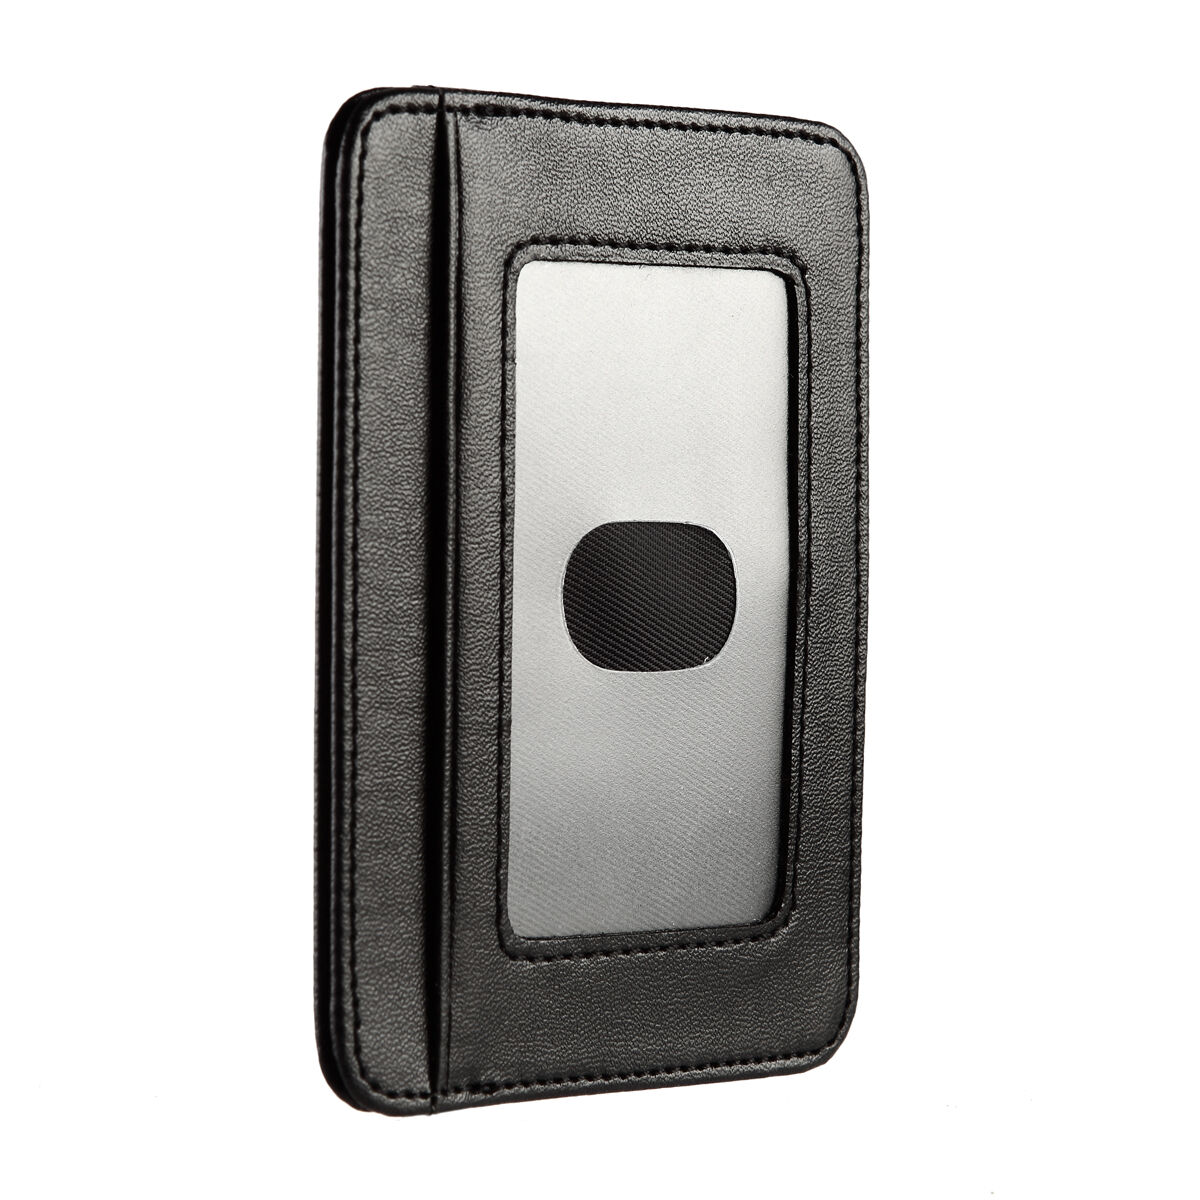 2 Pieces Slim Wallet RFID Wallet Minimalist Men Women Credit